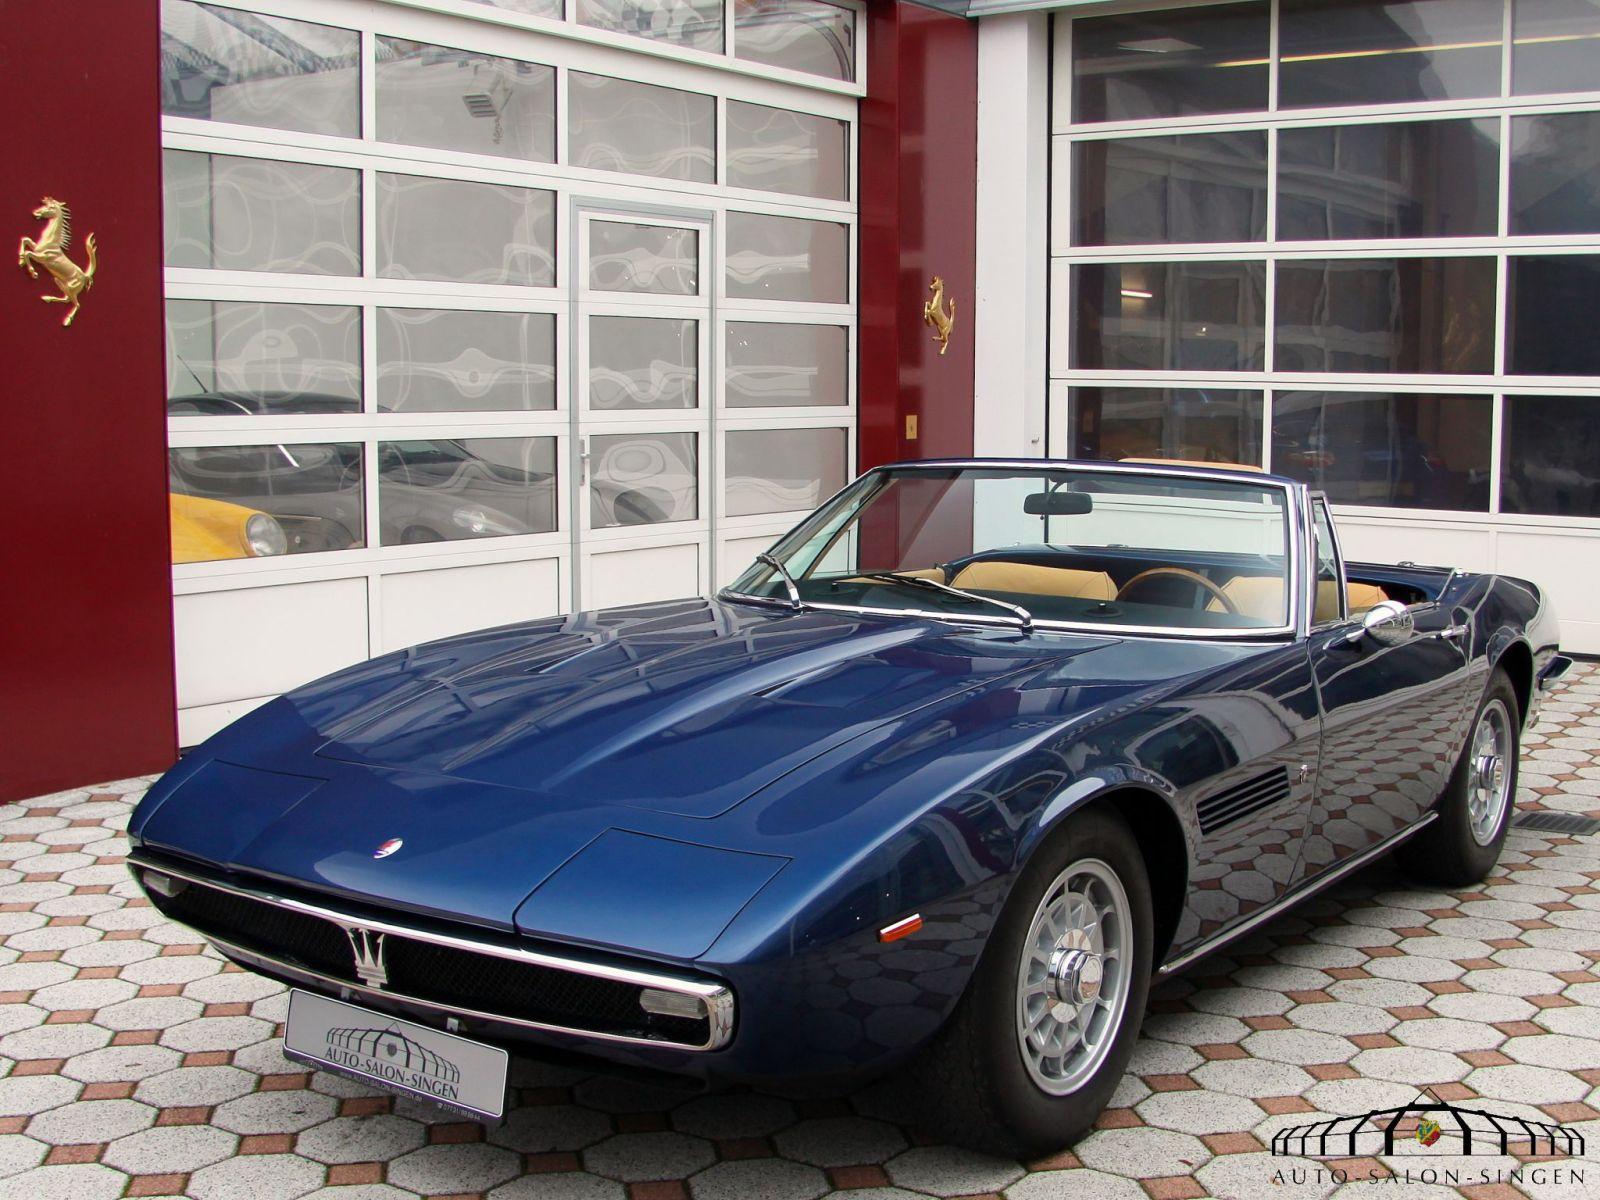 Maserati Ghibli Price >> Maserati Ghibli Spyder 4.7 Convertible - Auto Salon Singen